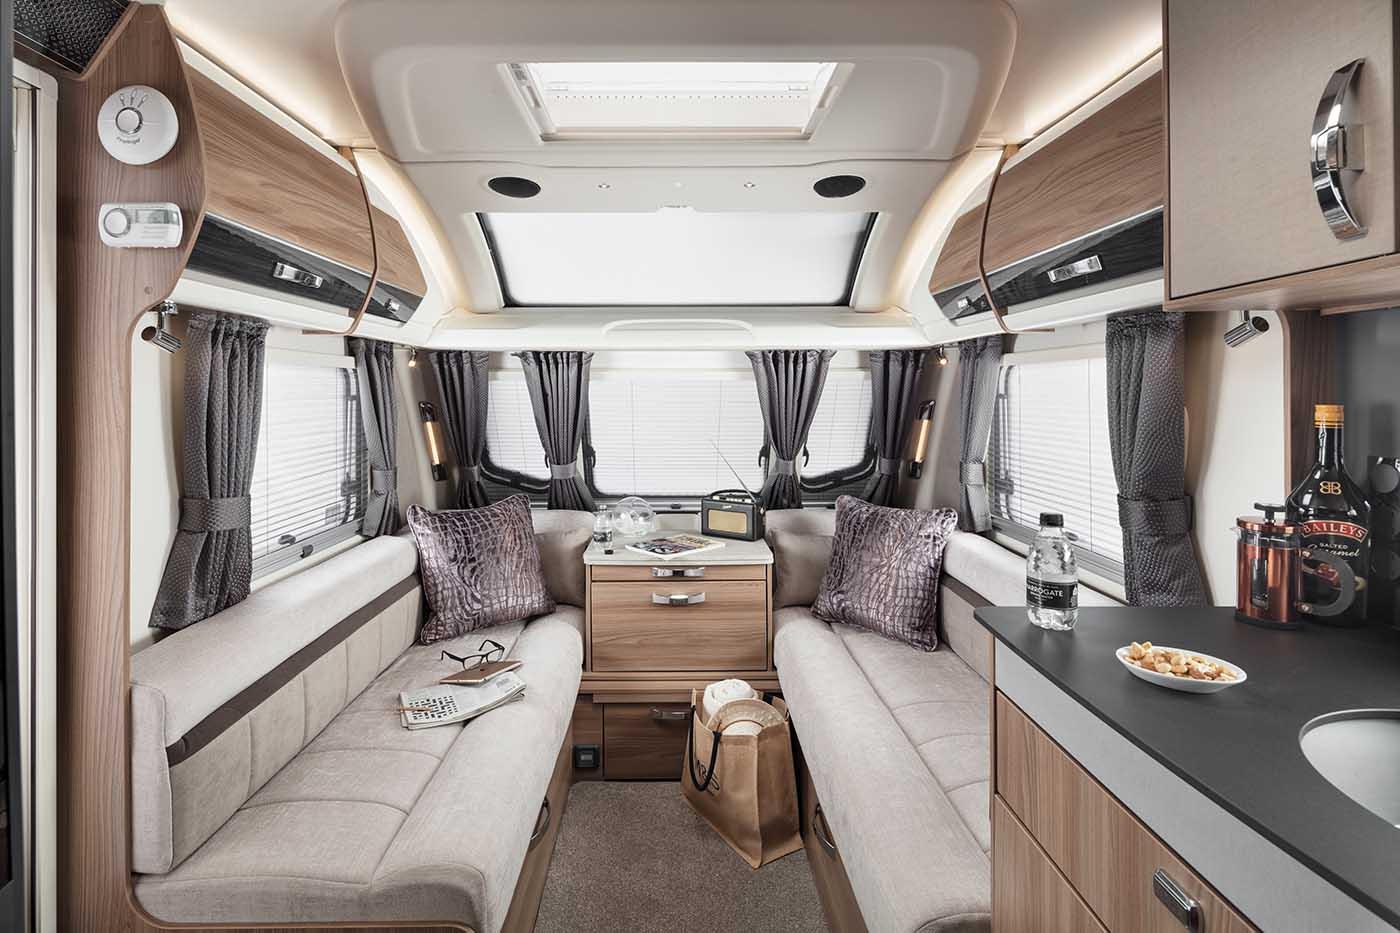 Swift Elegance Caravan Wandahome South Cave Ltd